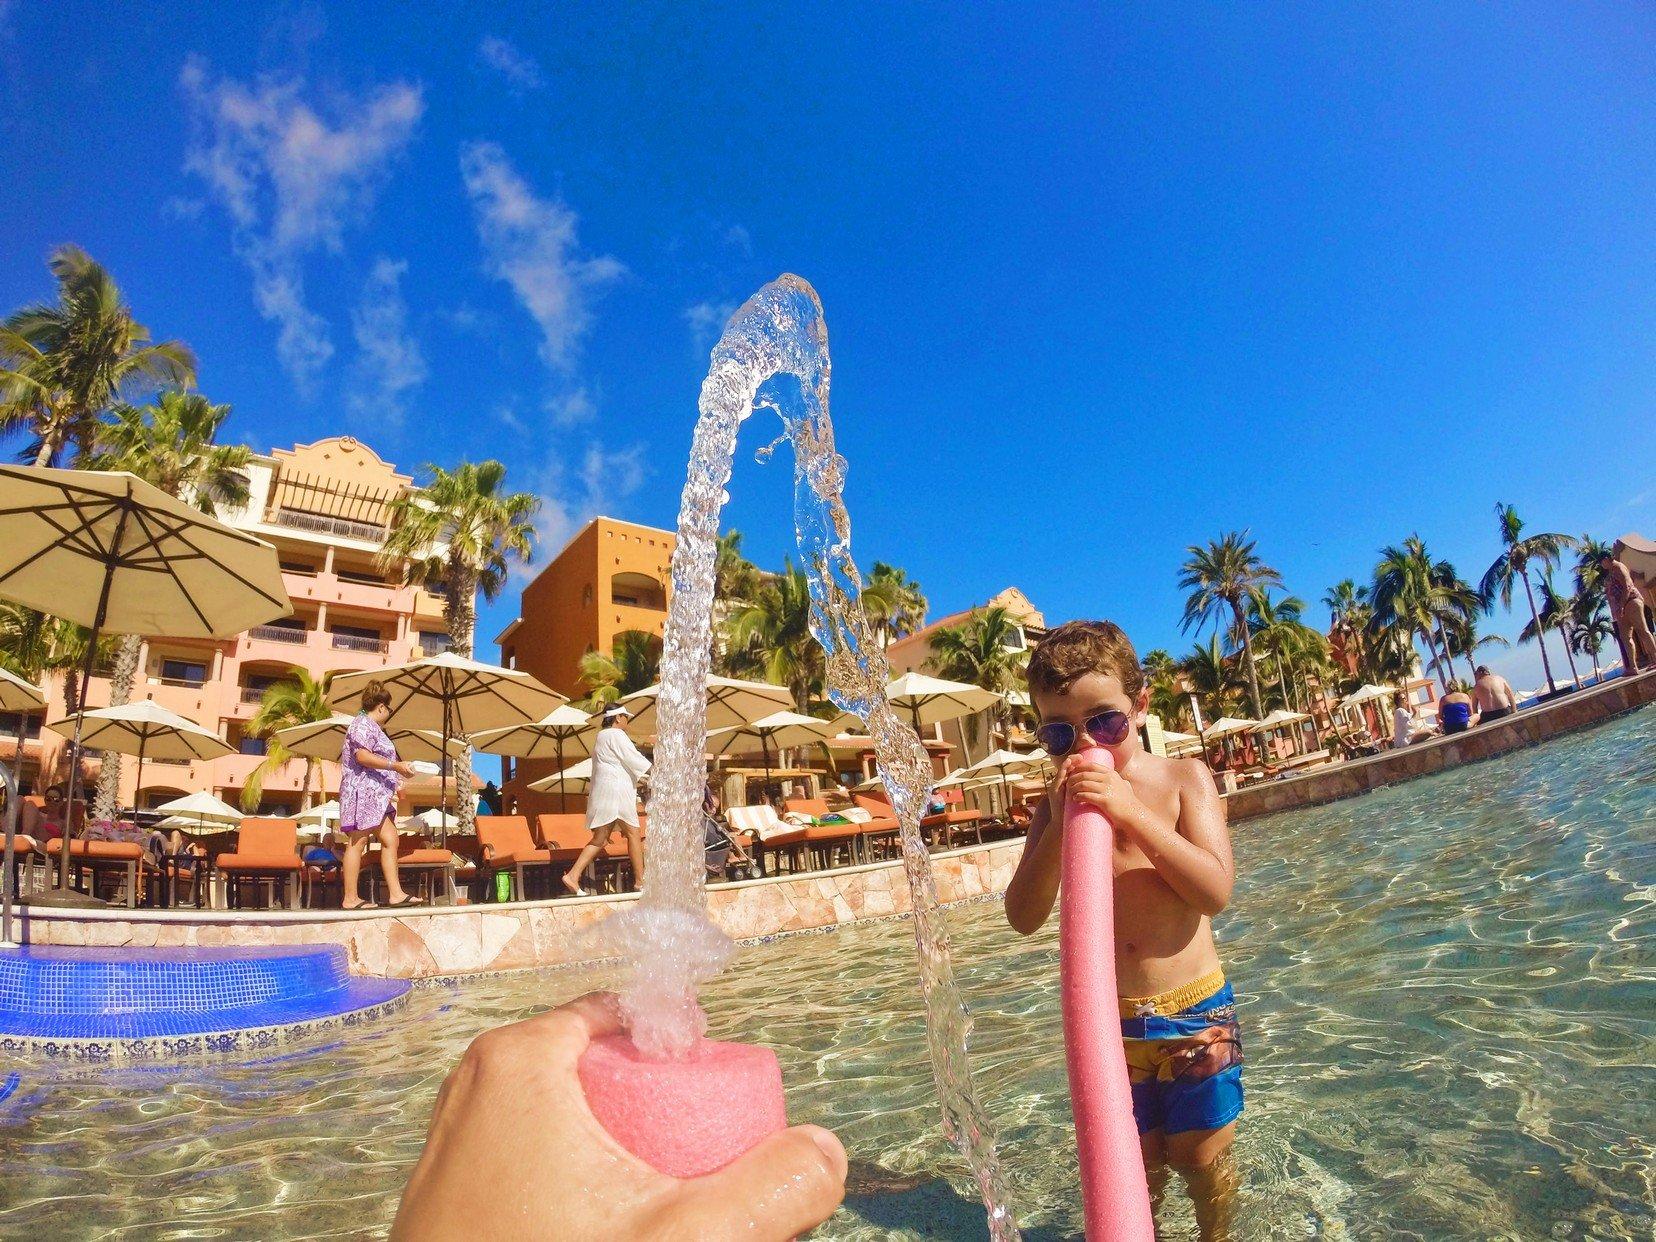 LittleMan-playing-in-pool-using-a-timeshare-at-Playa-Grande-Cabo-San-Lucas-1.jpg